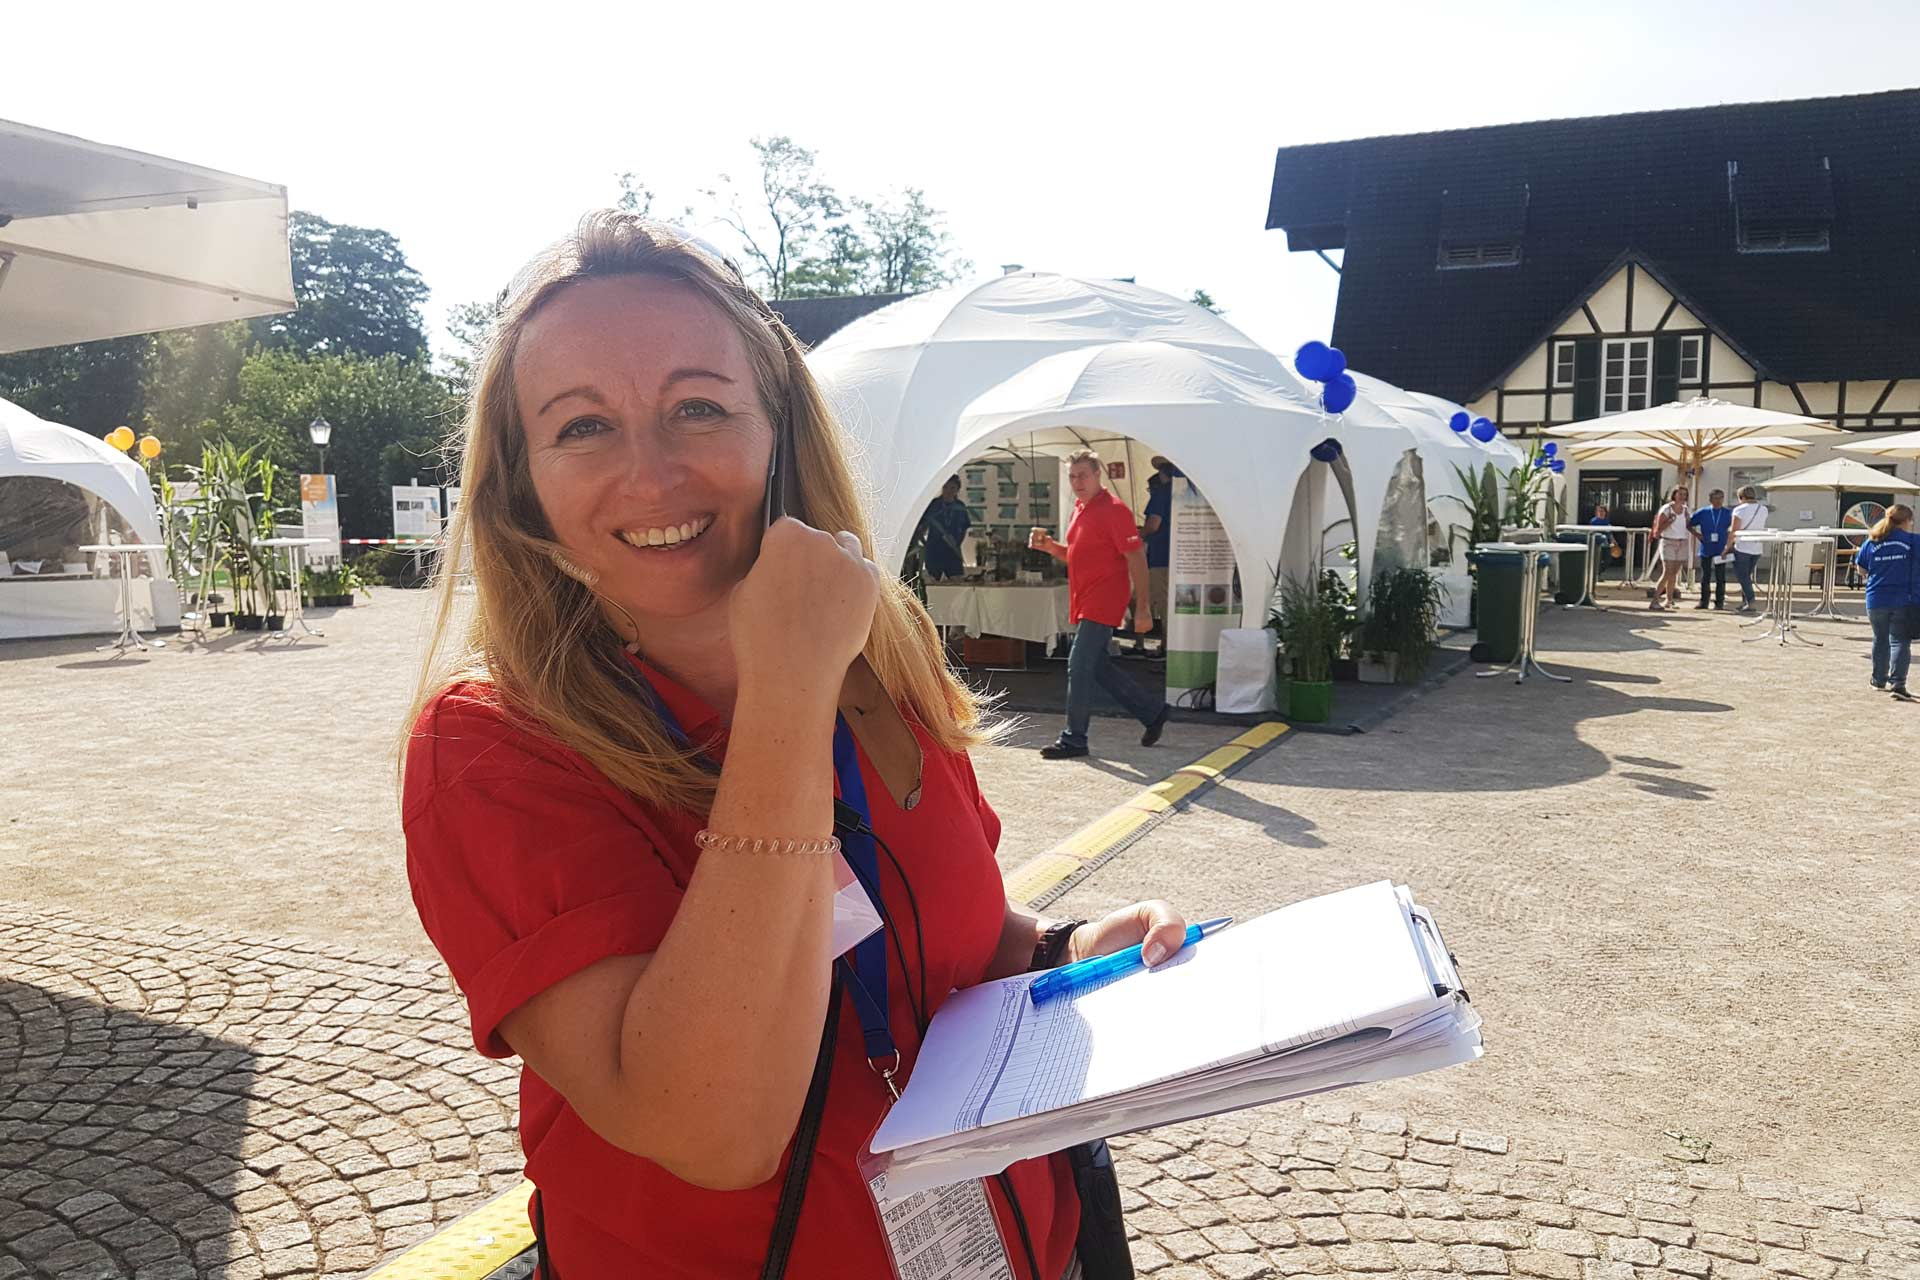 Agentur Ressmann - Alexandra Altmann - BASF Bauernmarkt